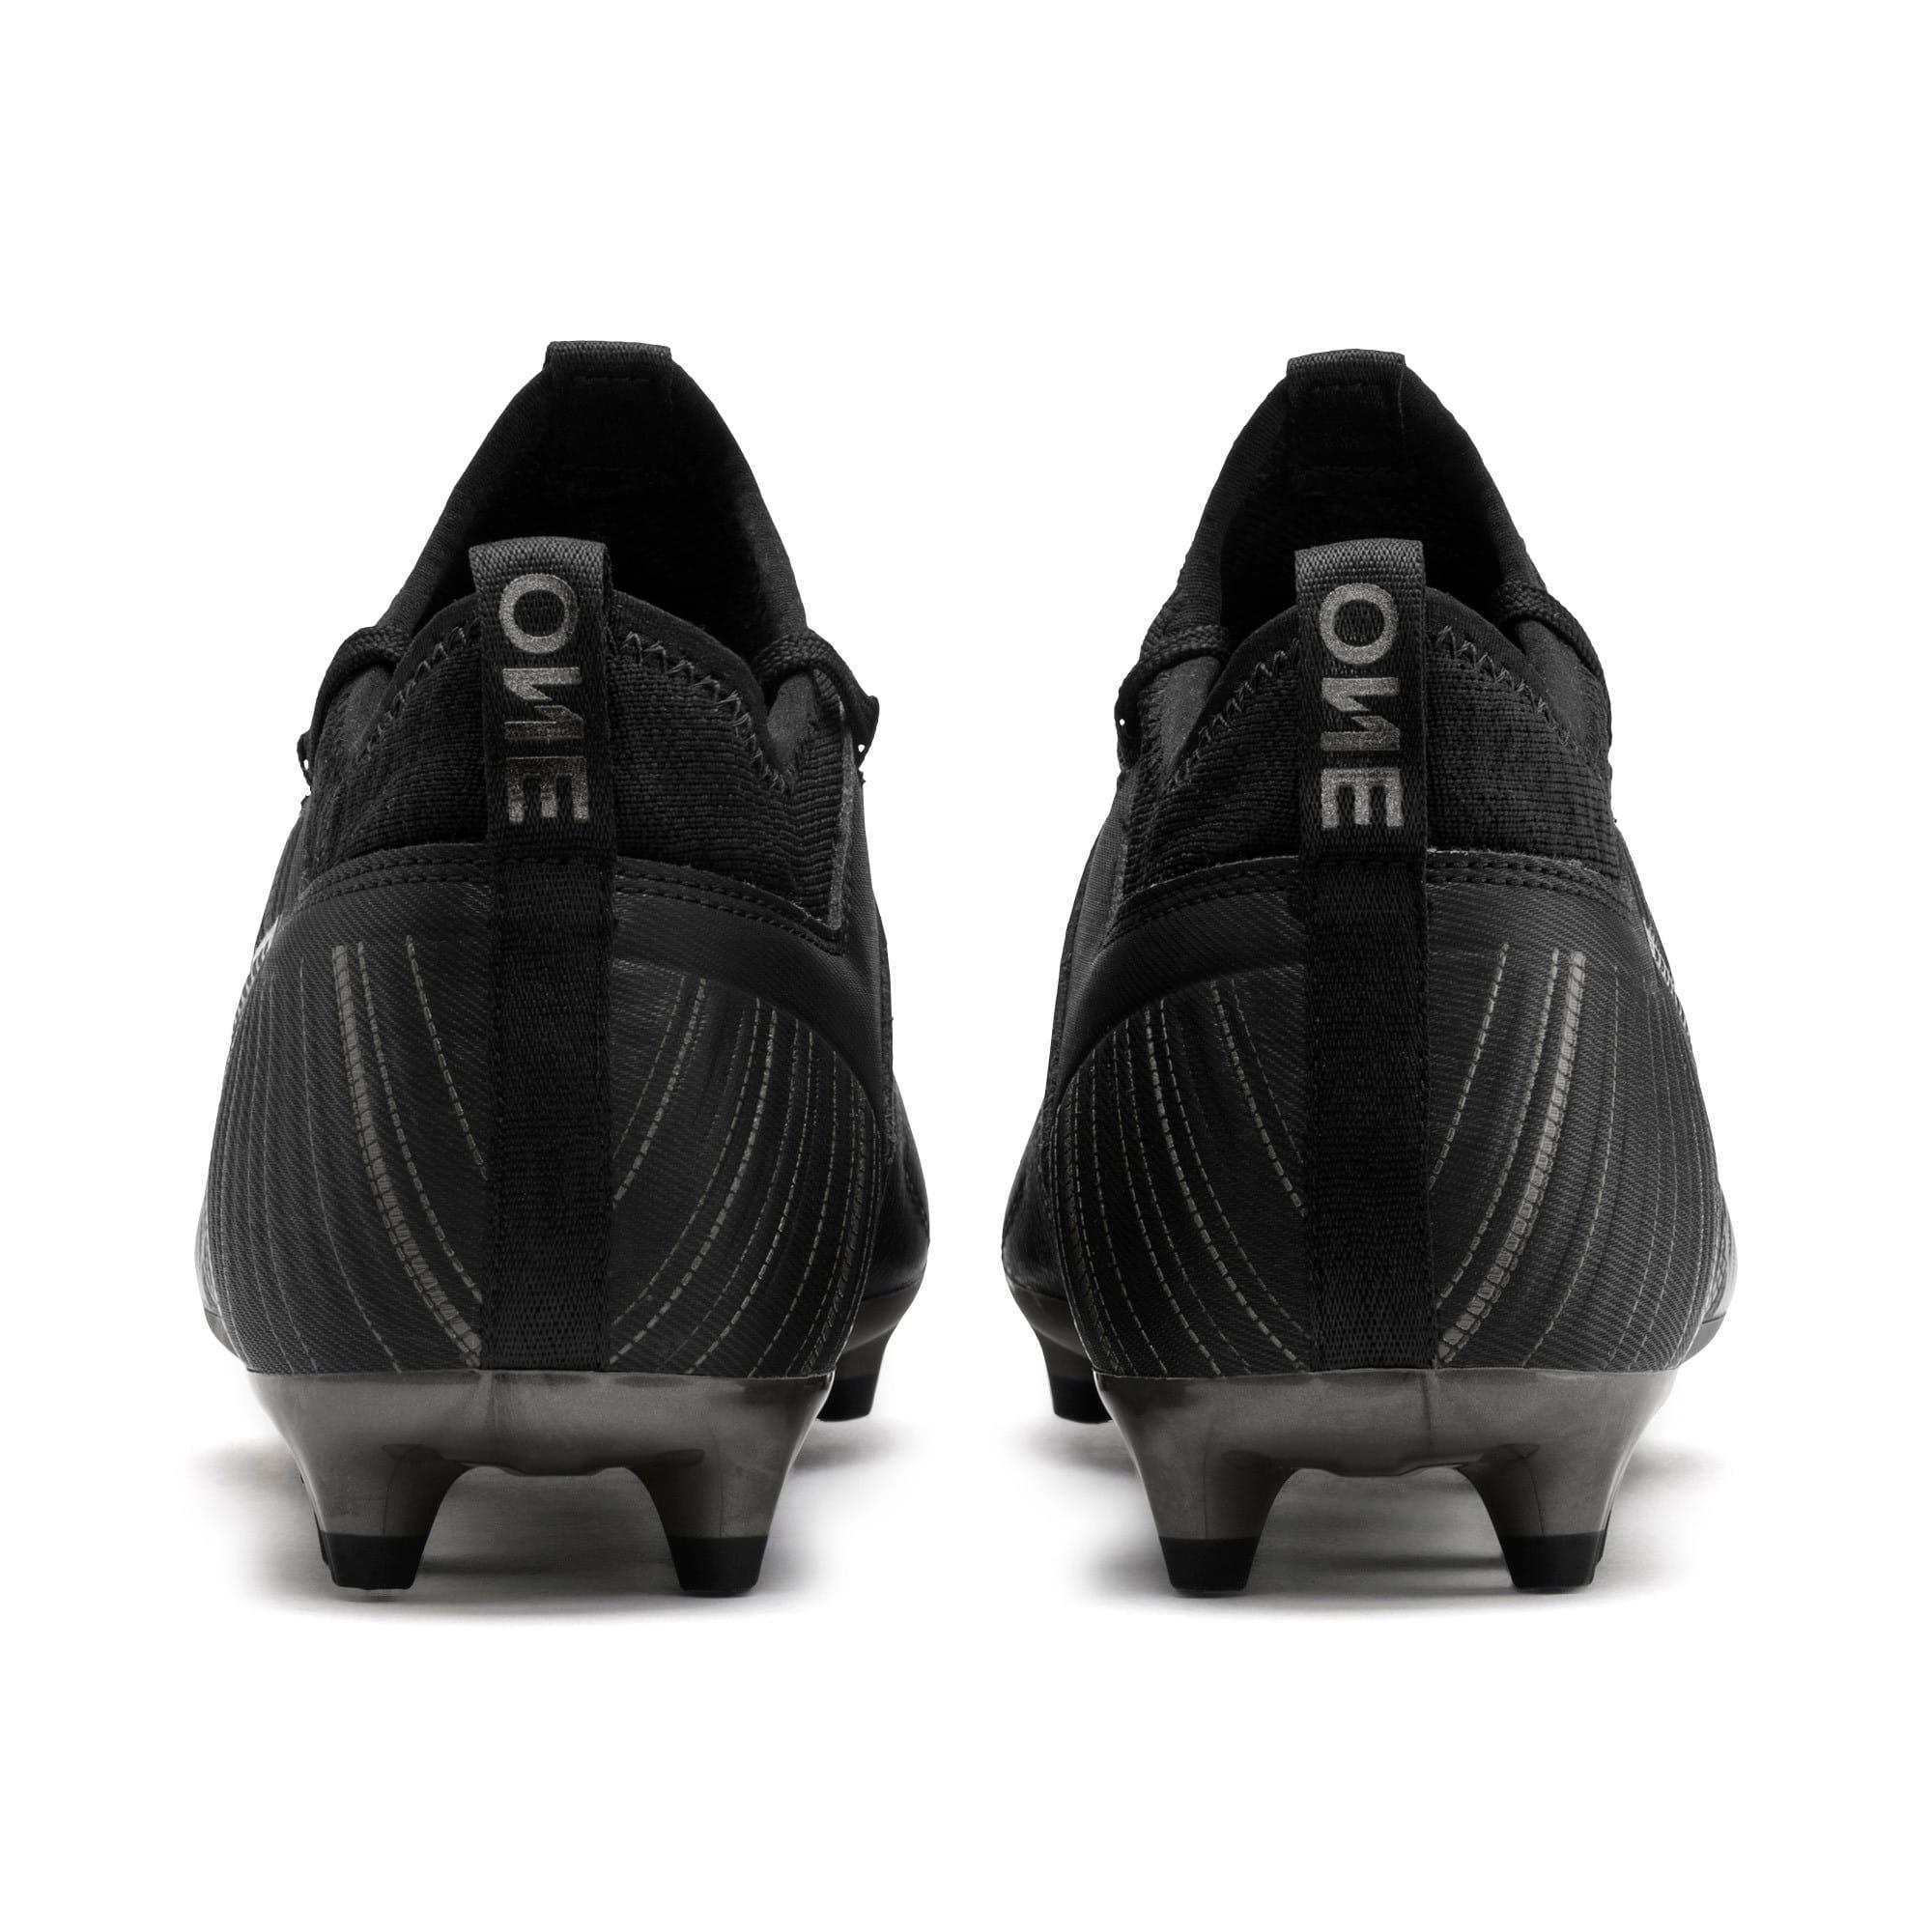 Thumbnail 4 van PUMA ONE 5.3 FG/AG voetbalschoenen voor mannen, Black-Black-Puma Aged Silver, medium